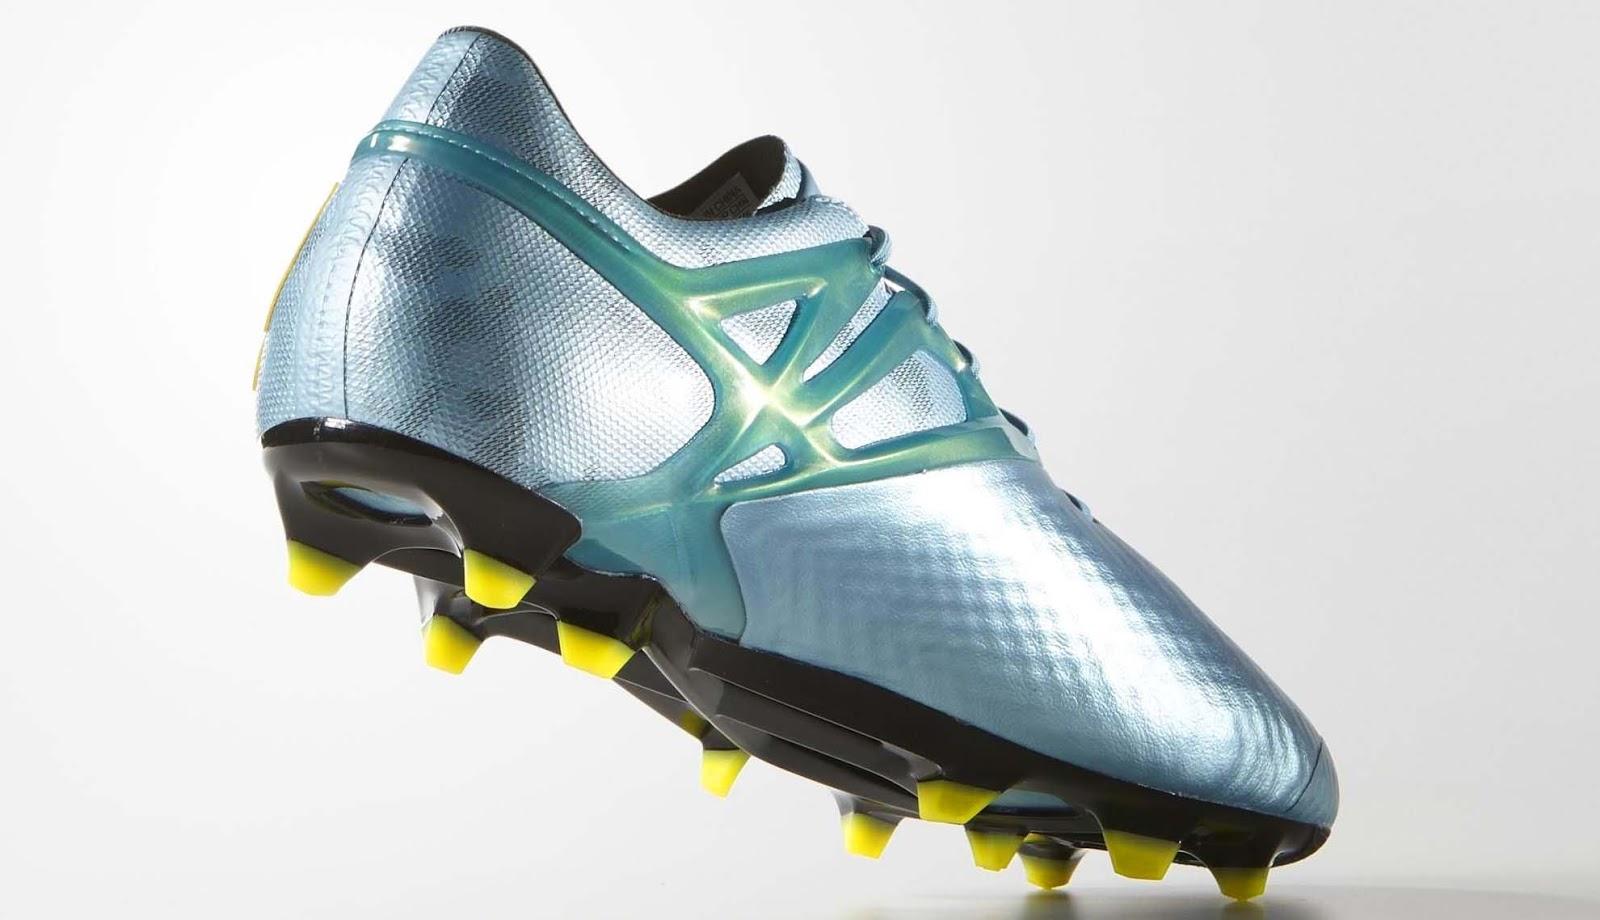 Nike Nemesis Shoes